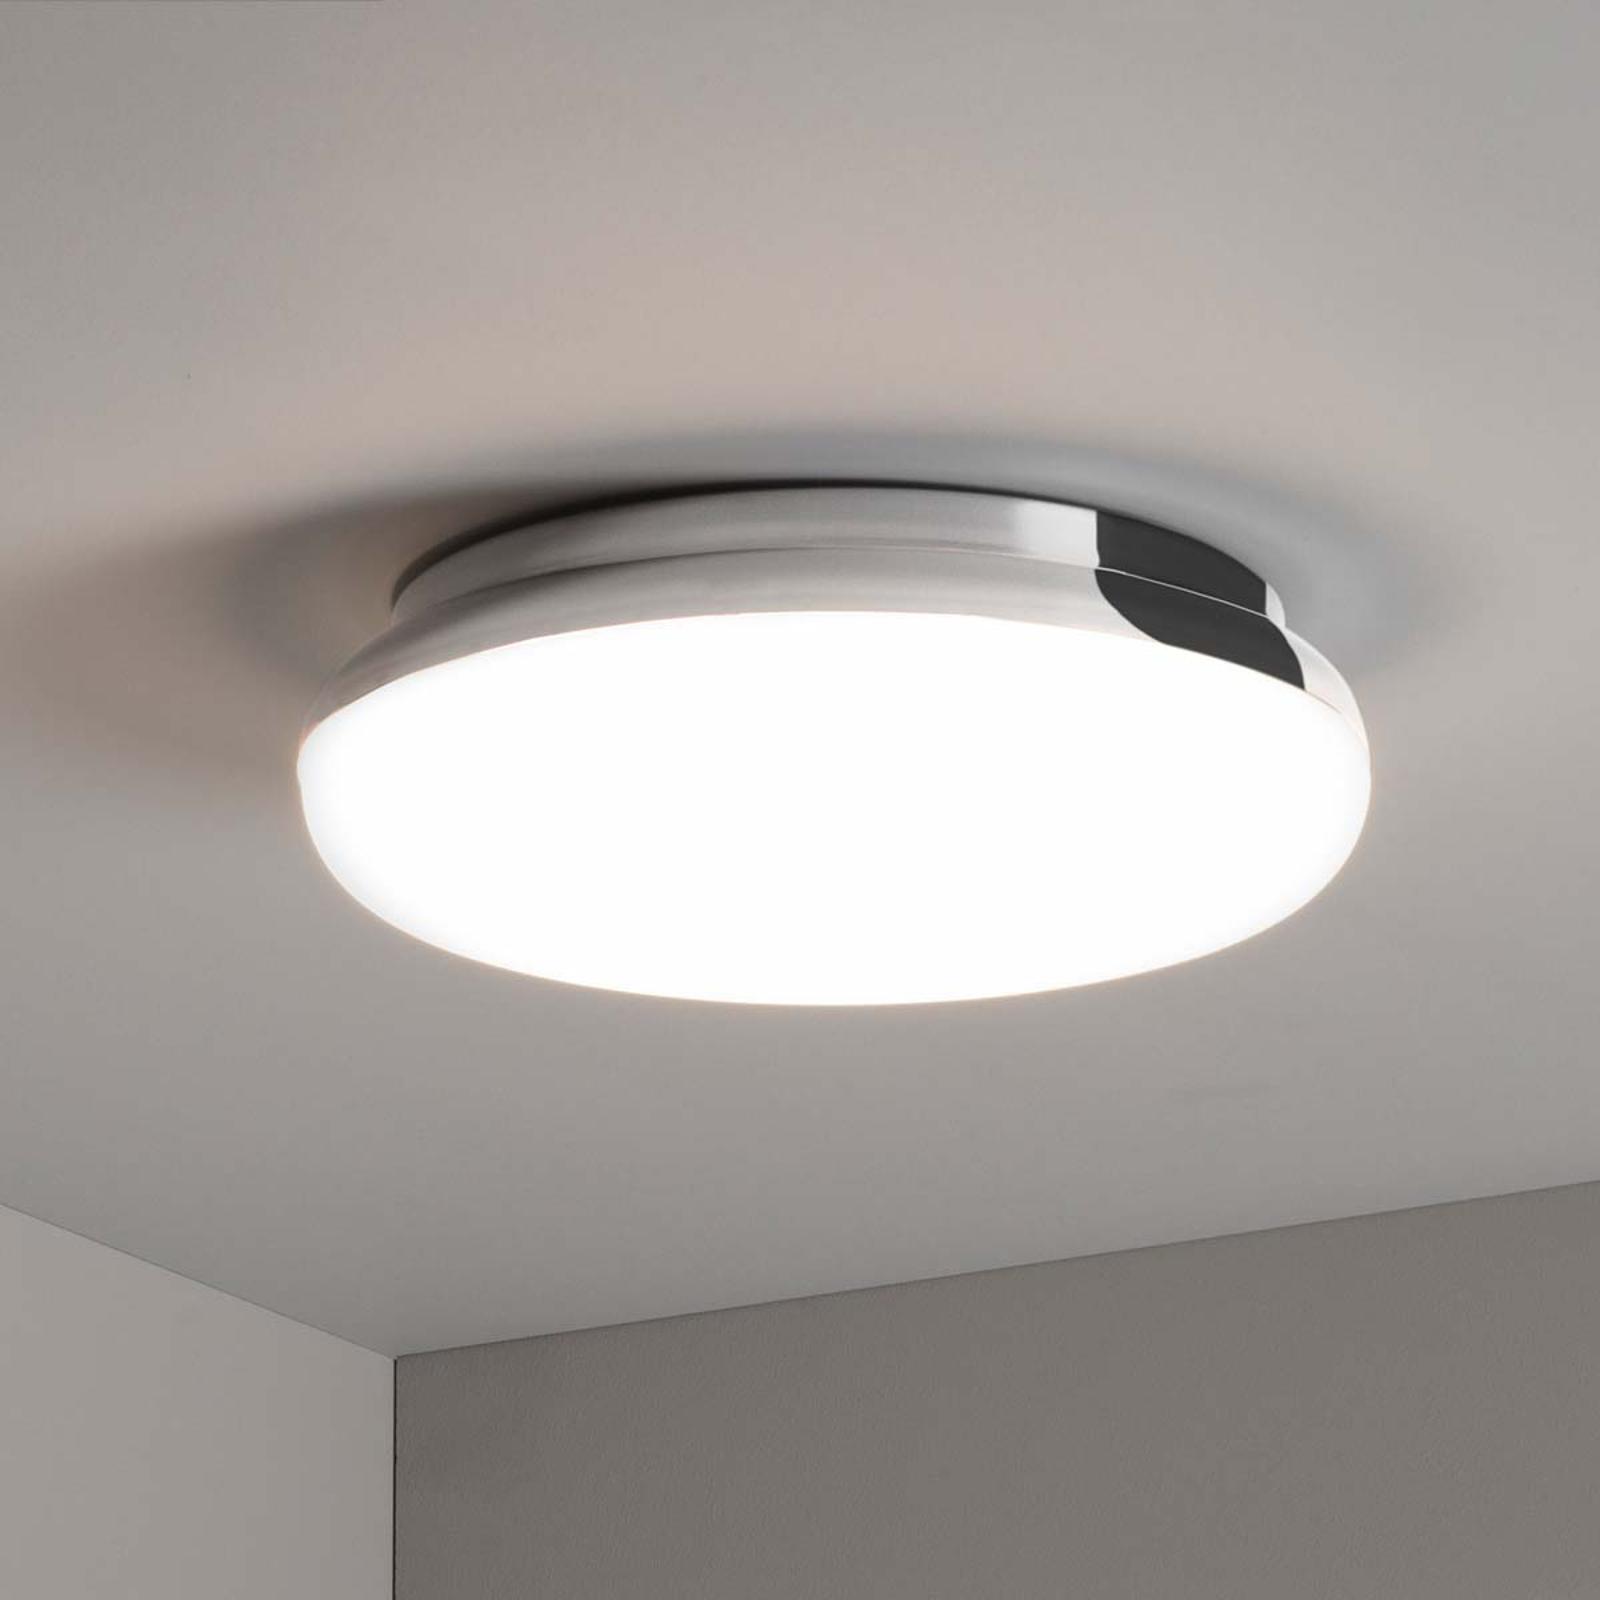 Astro Altea ceiling light, glass lampshade Ø 30 cm_1020081_1